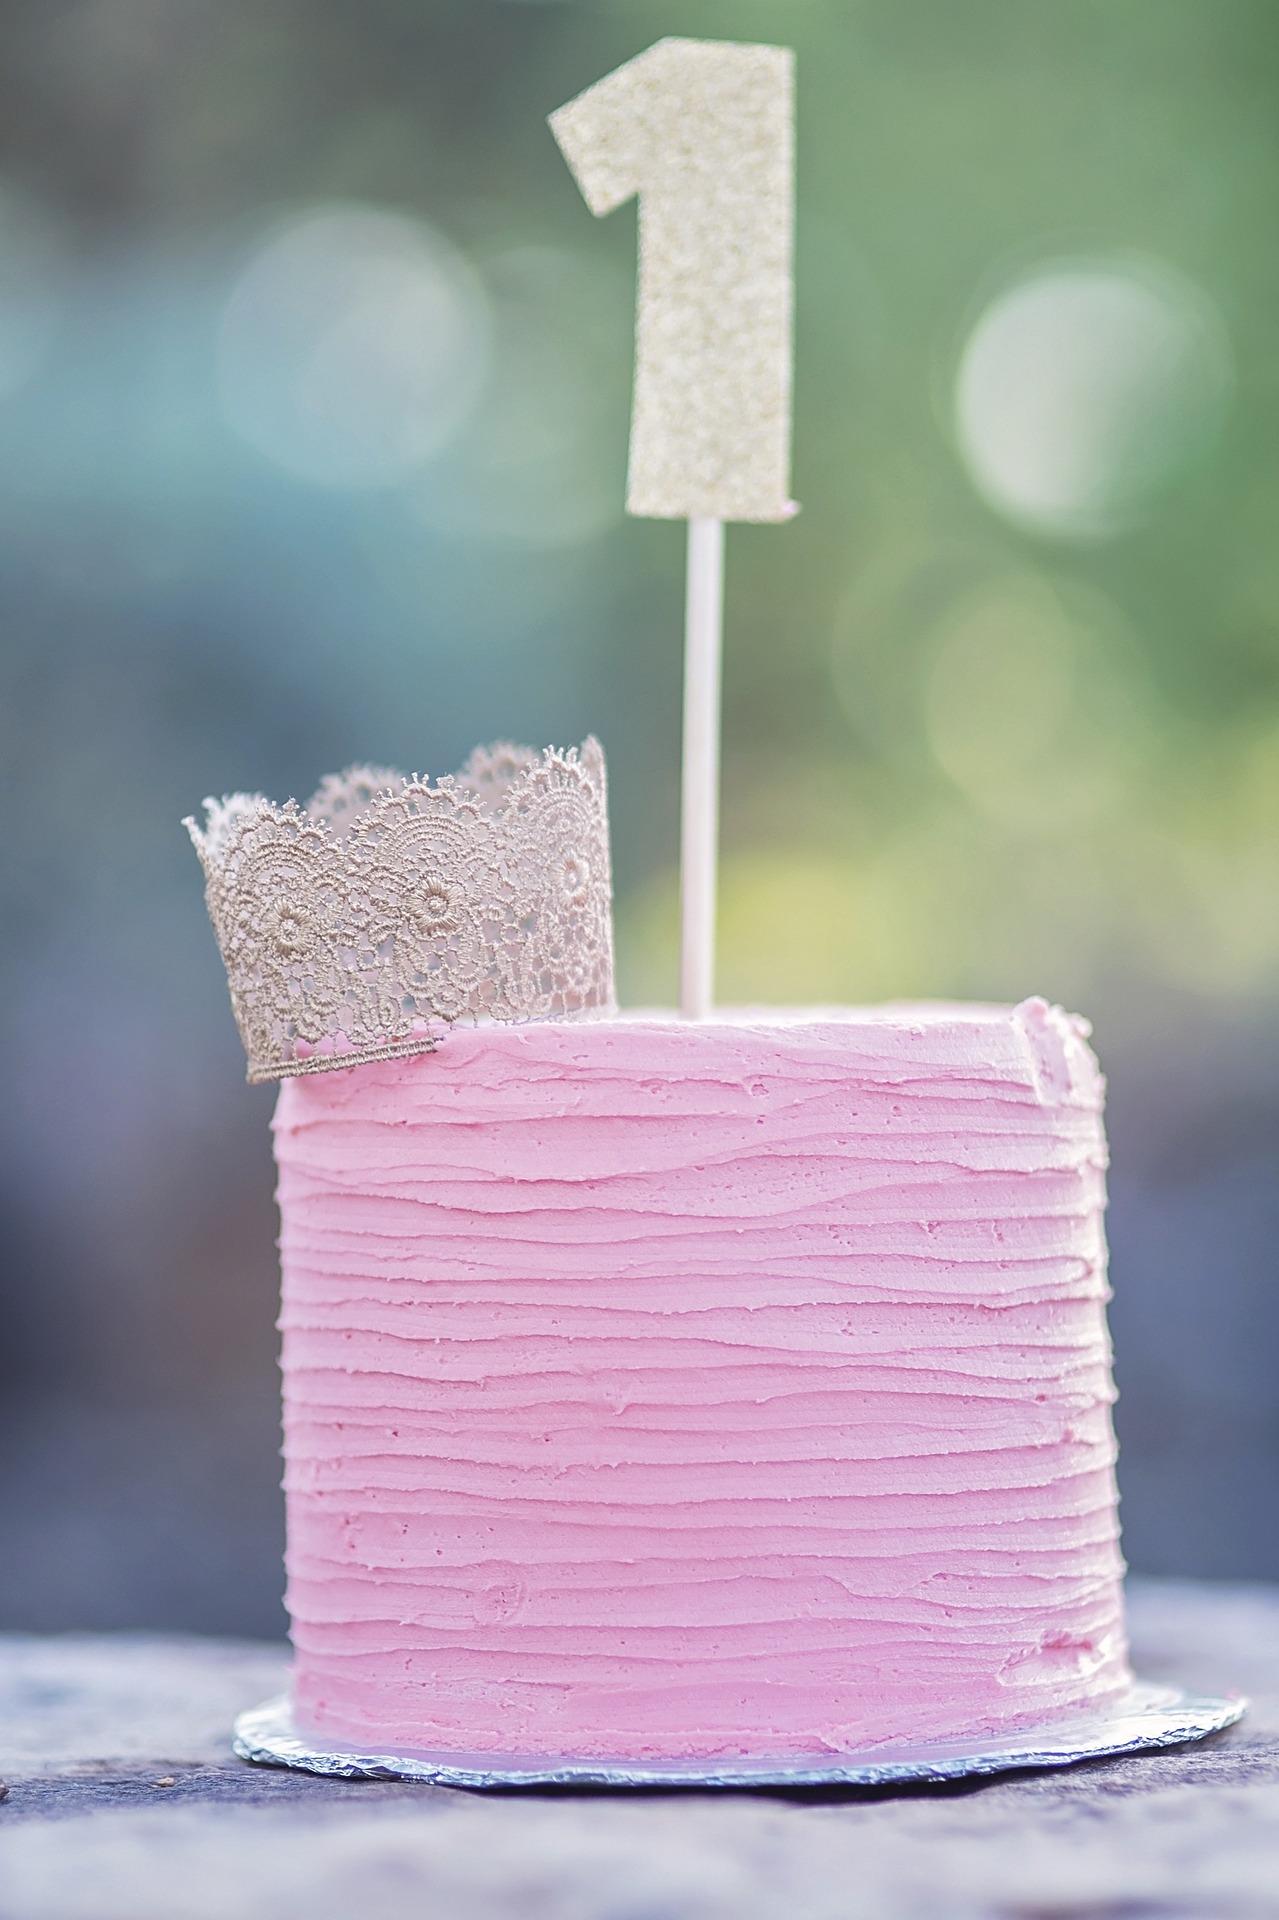 cake-smash-2485718_1920.jpg